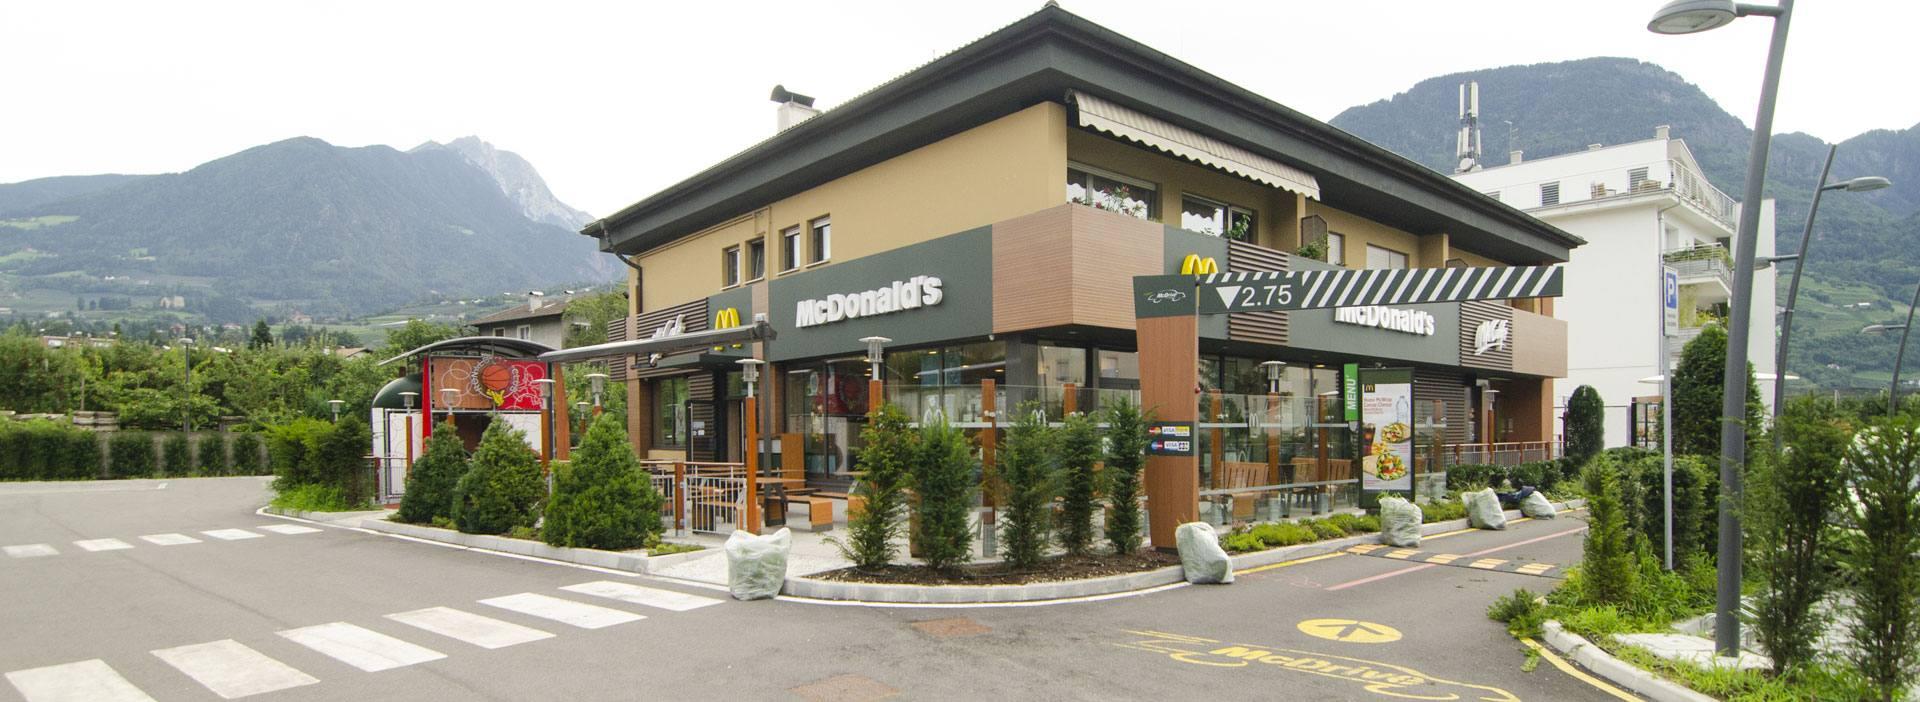 McDonald's Merano